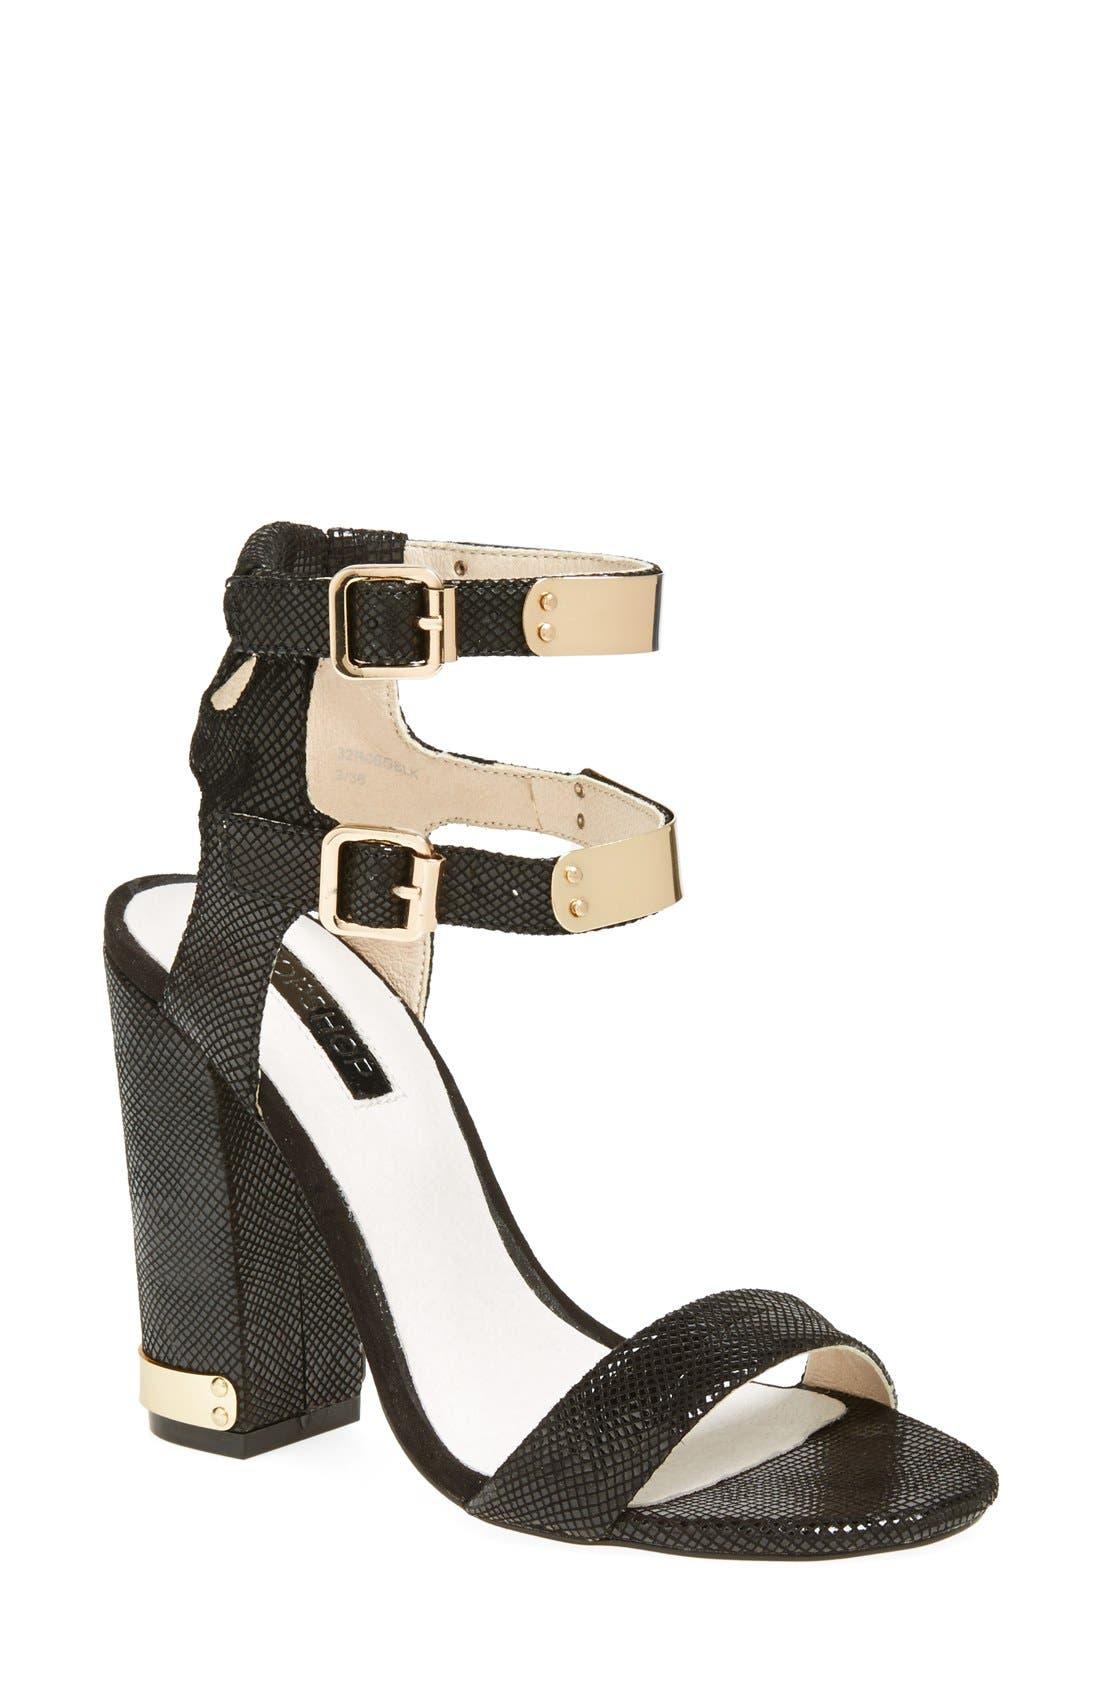 Main Image - Topshop 'Rodeo' Double Strap Sandal